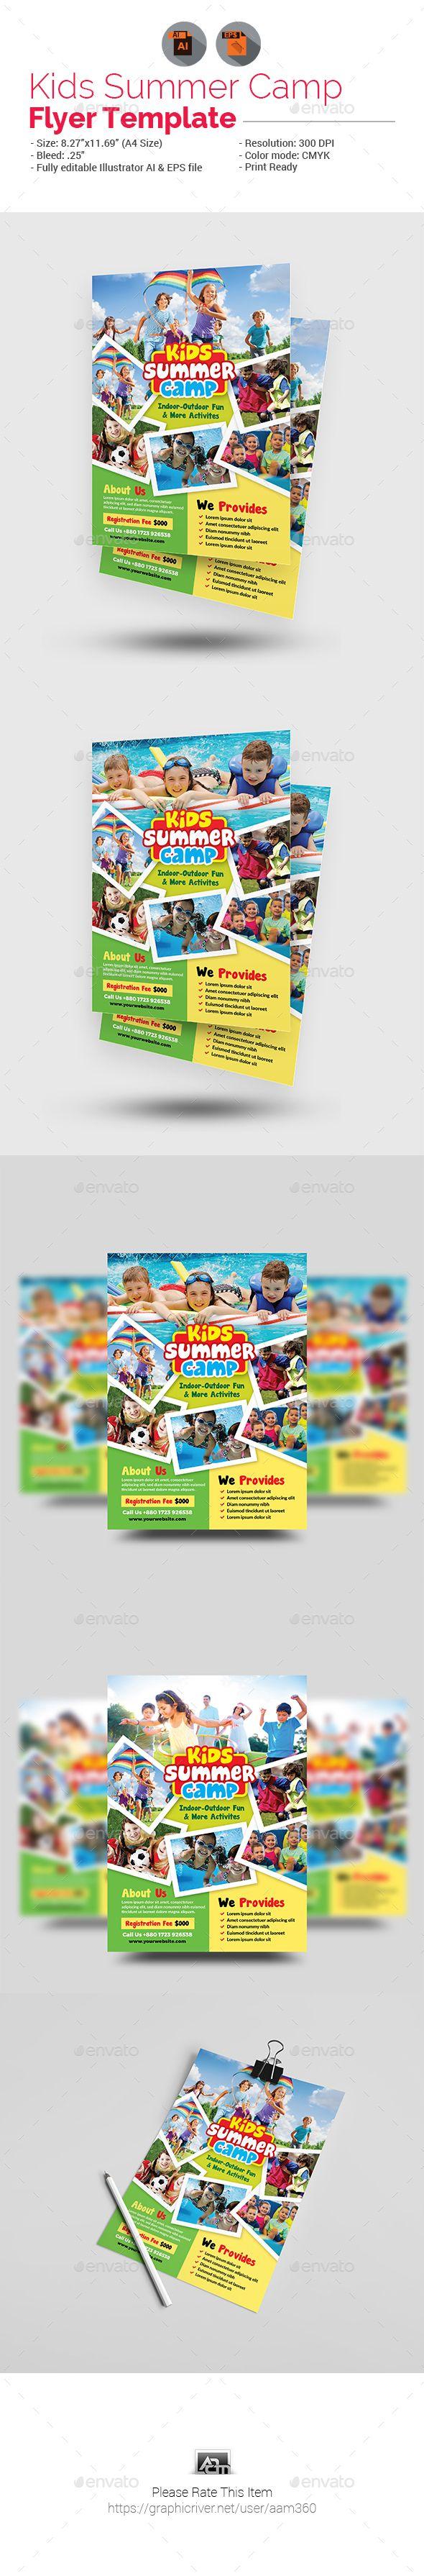 Kids Summer Camp Flyer | Campamento